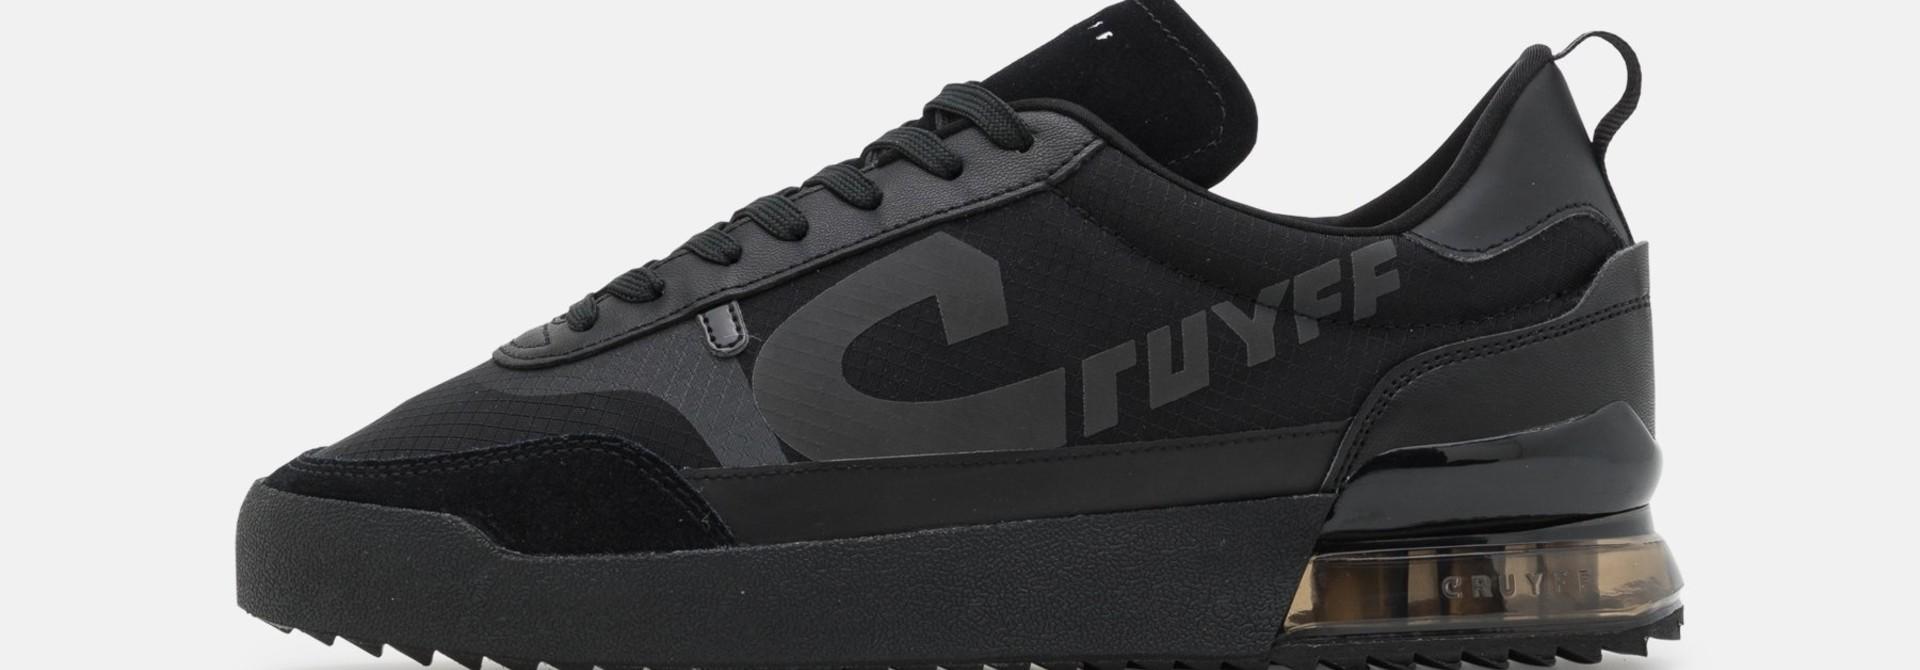 Cruyff Contra Black